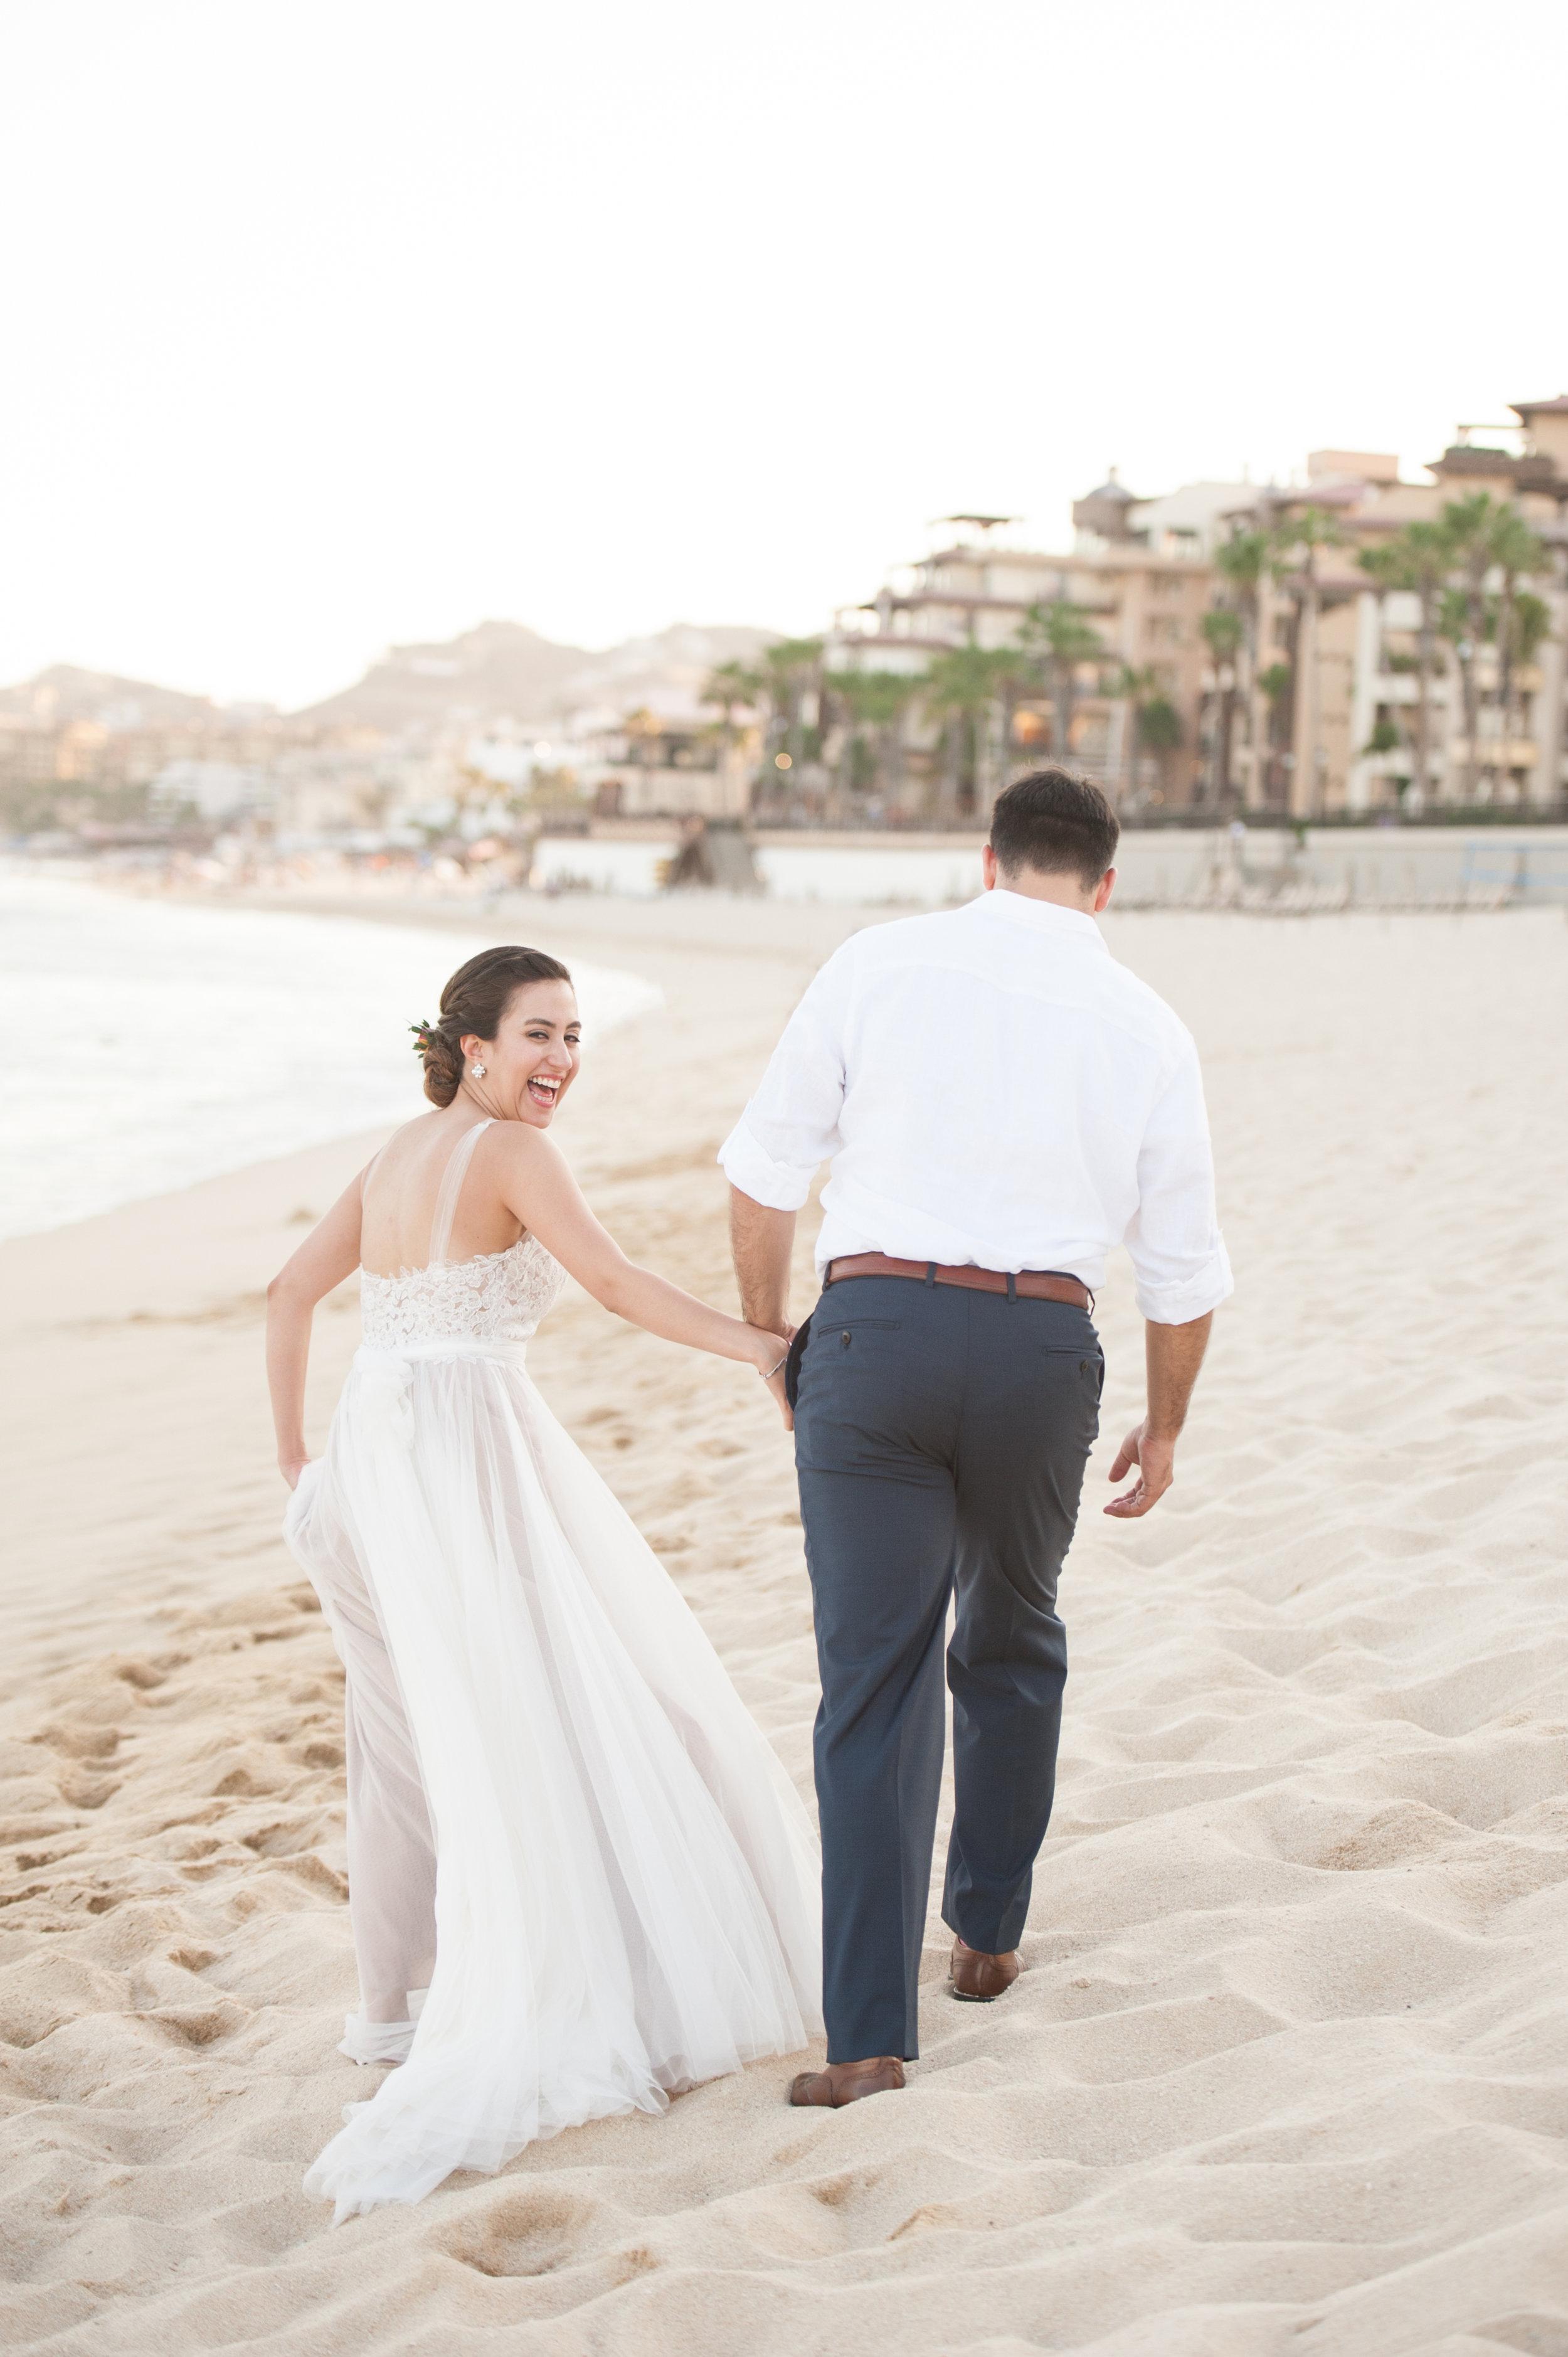 cabo mexico wedding photographer travel destination beach resort sunset